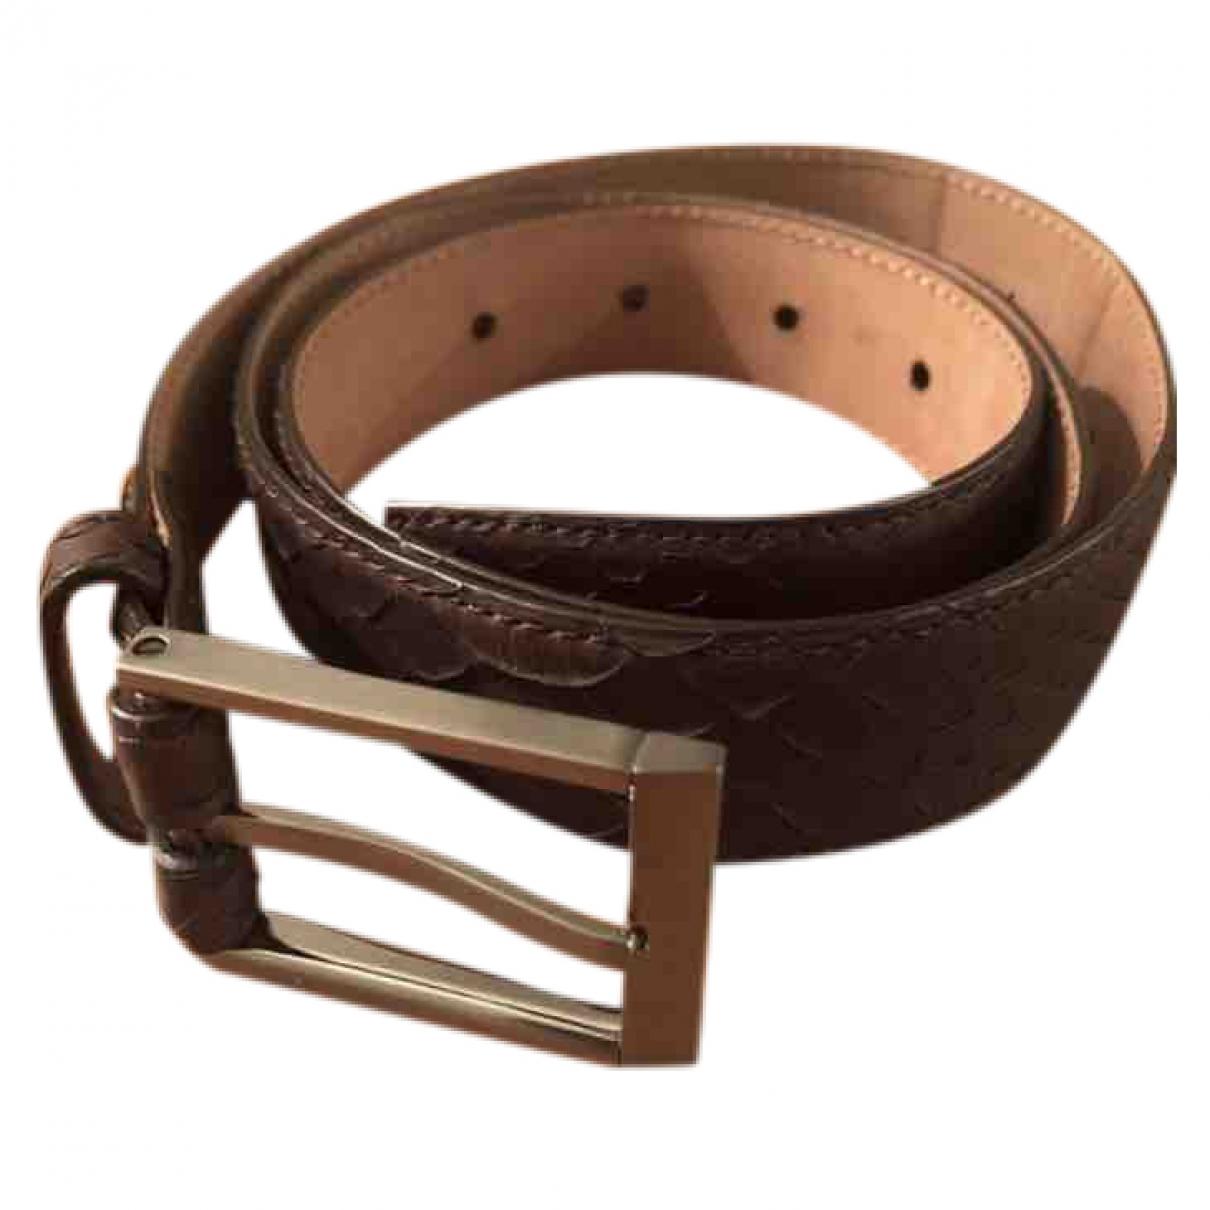 Cinturon de Piton Lanvin